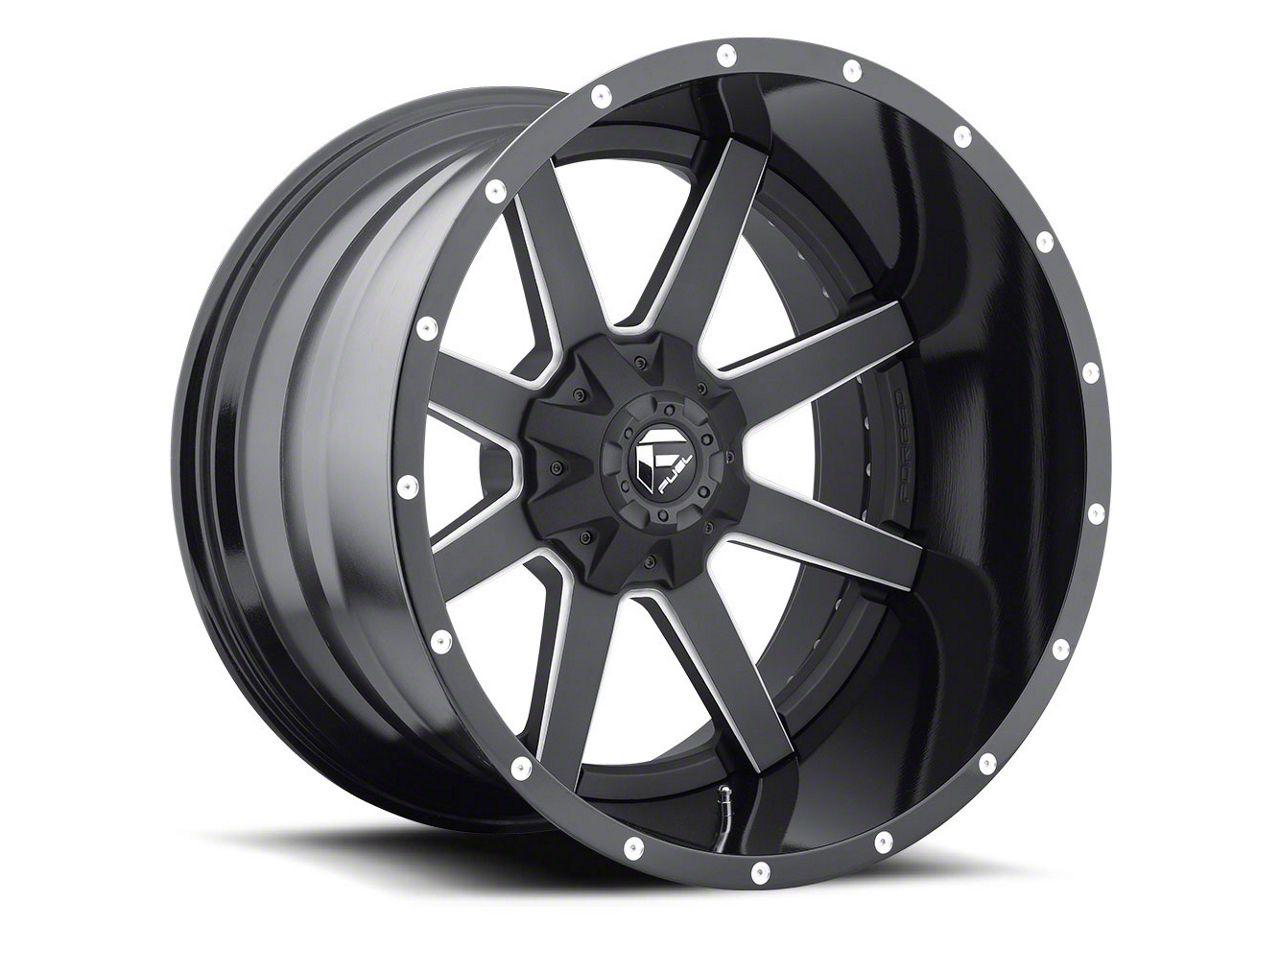 Fuel Wheels Maverick 2-Piece Black Milled 6-Lug Wheel - 20x14 (99-18 Silverado 1500)